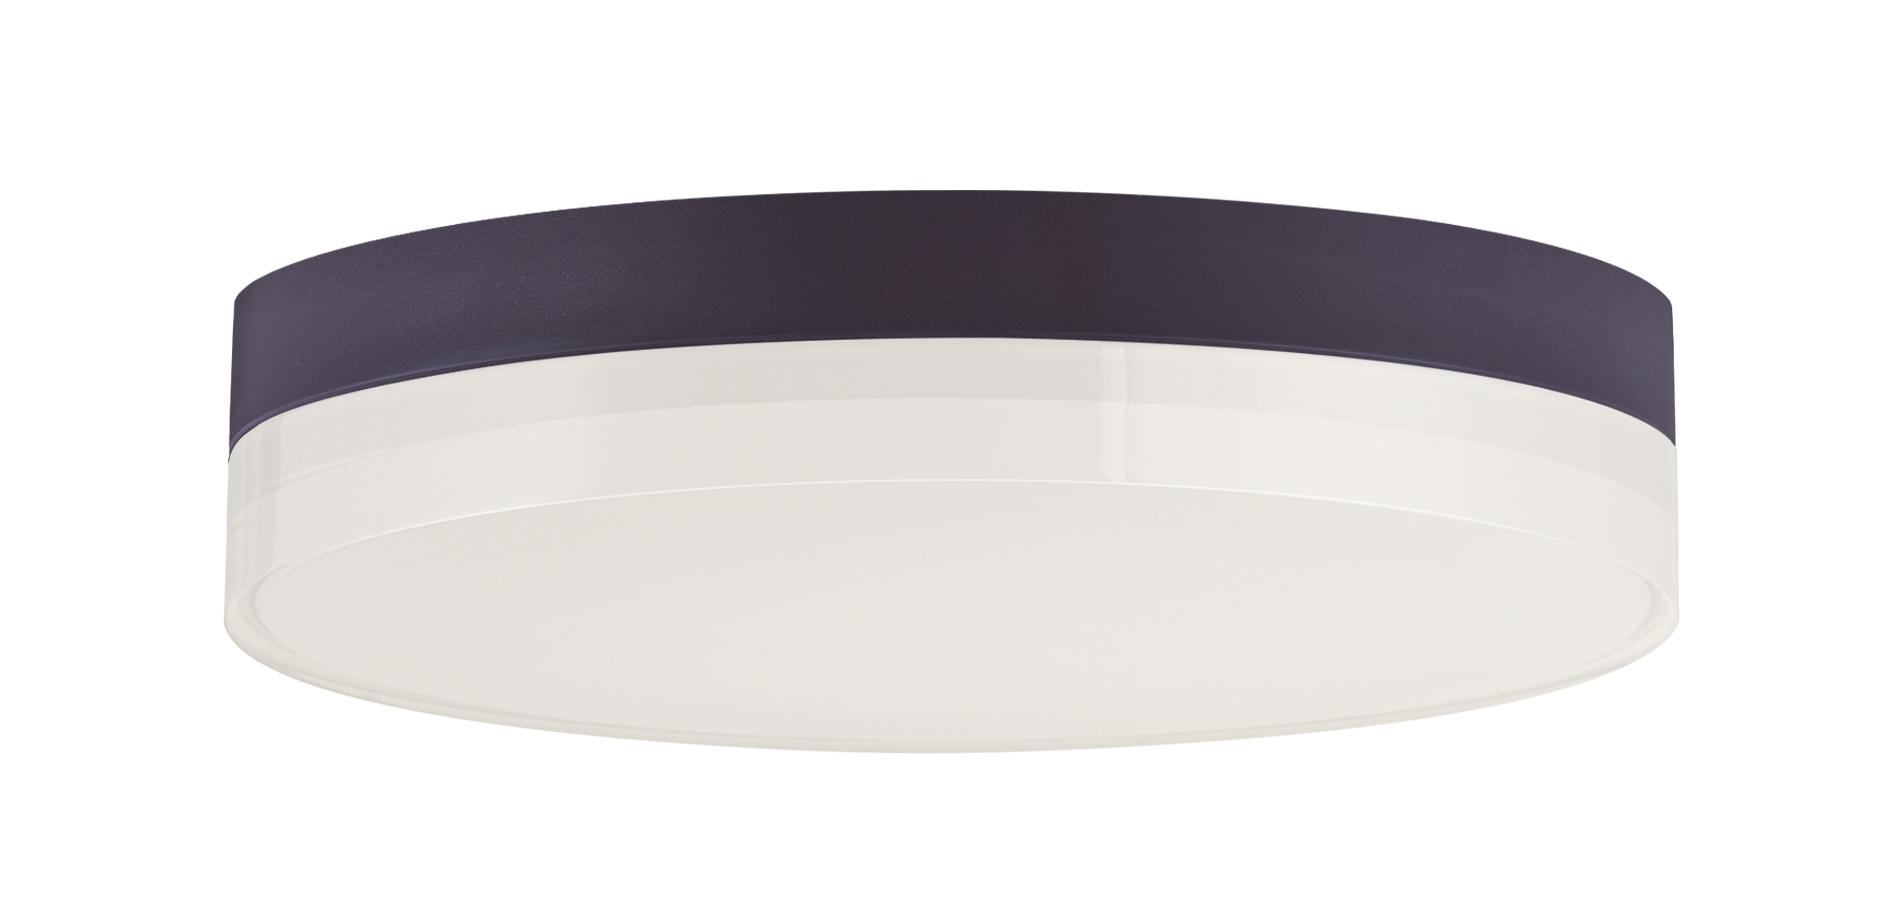 Illuminaire II 9-inch Round LED Flush Mount 3000K | Maxim Lighting